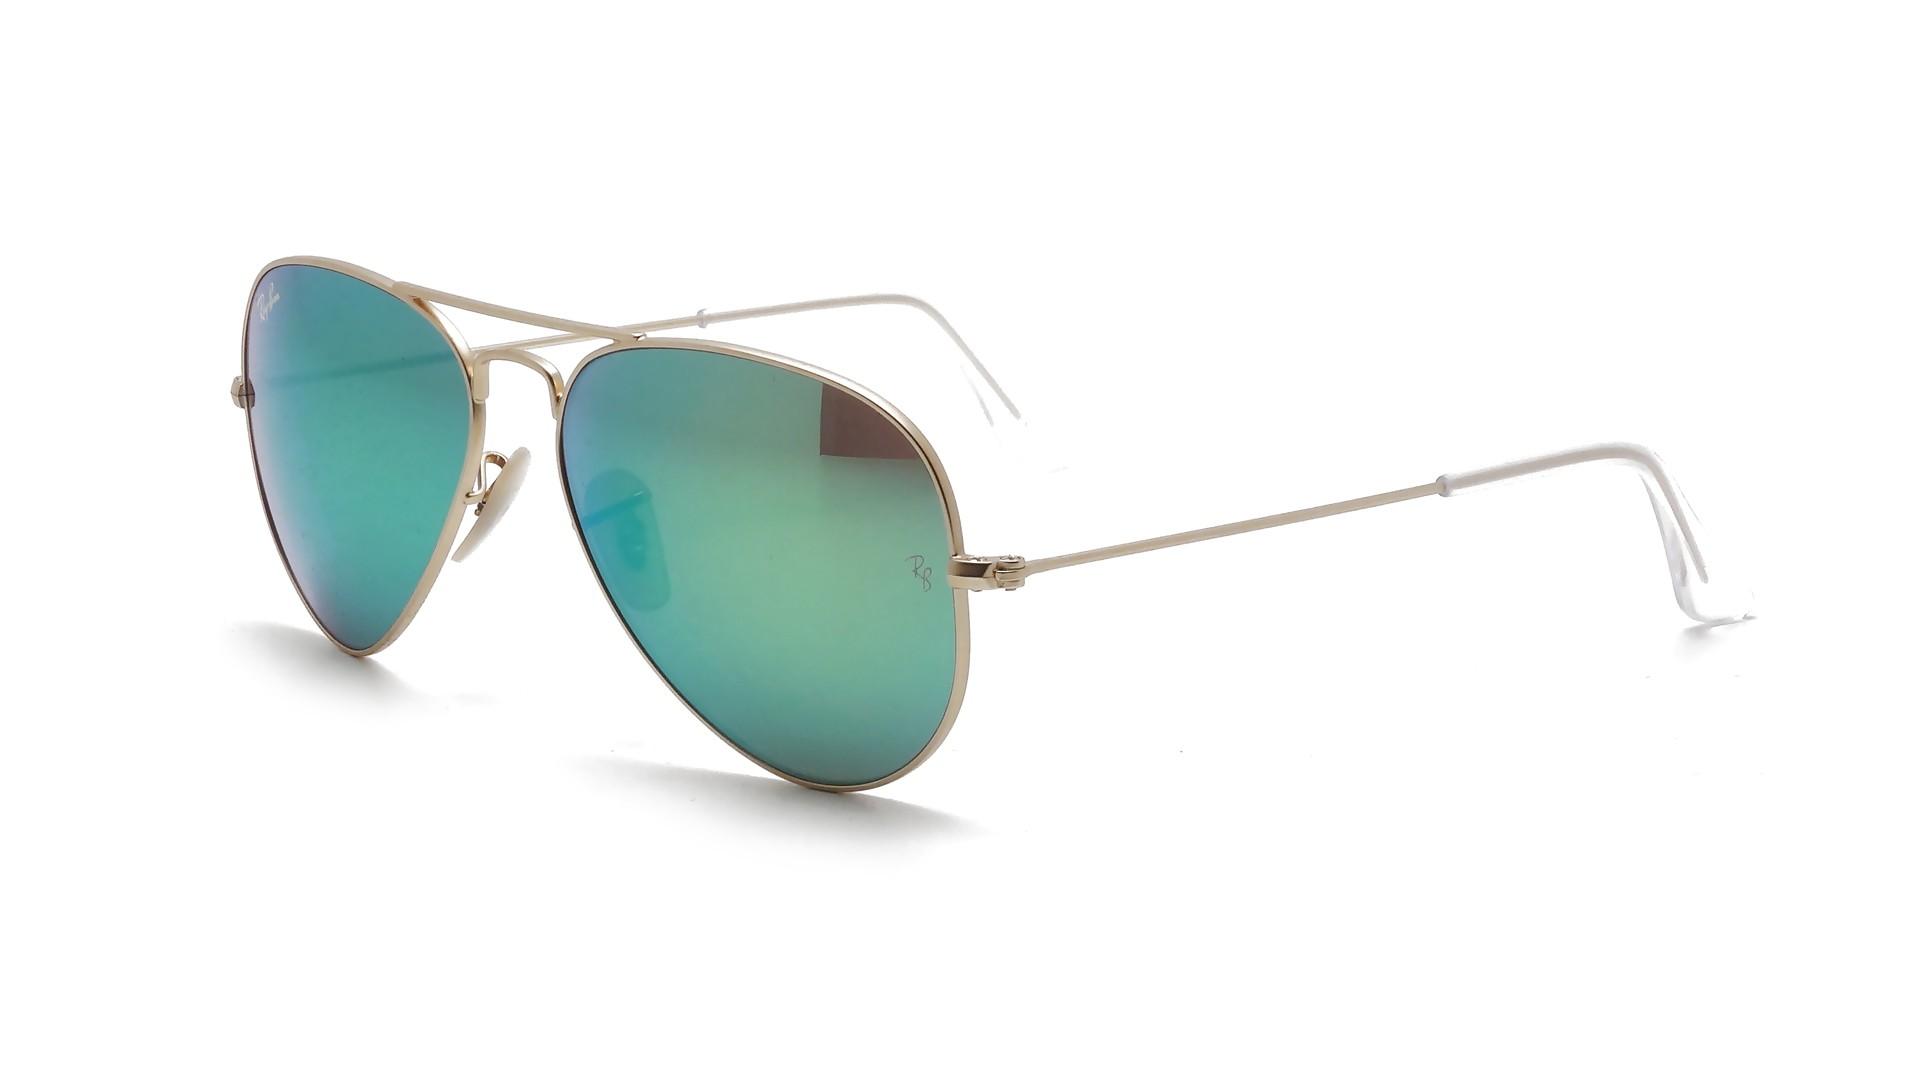 Ray ban aviator metal or miroir vert rb3025 112 19 prix for Lunettes de soleil ray ban aviator miroir